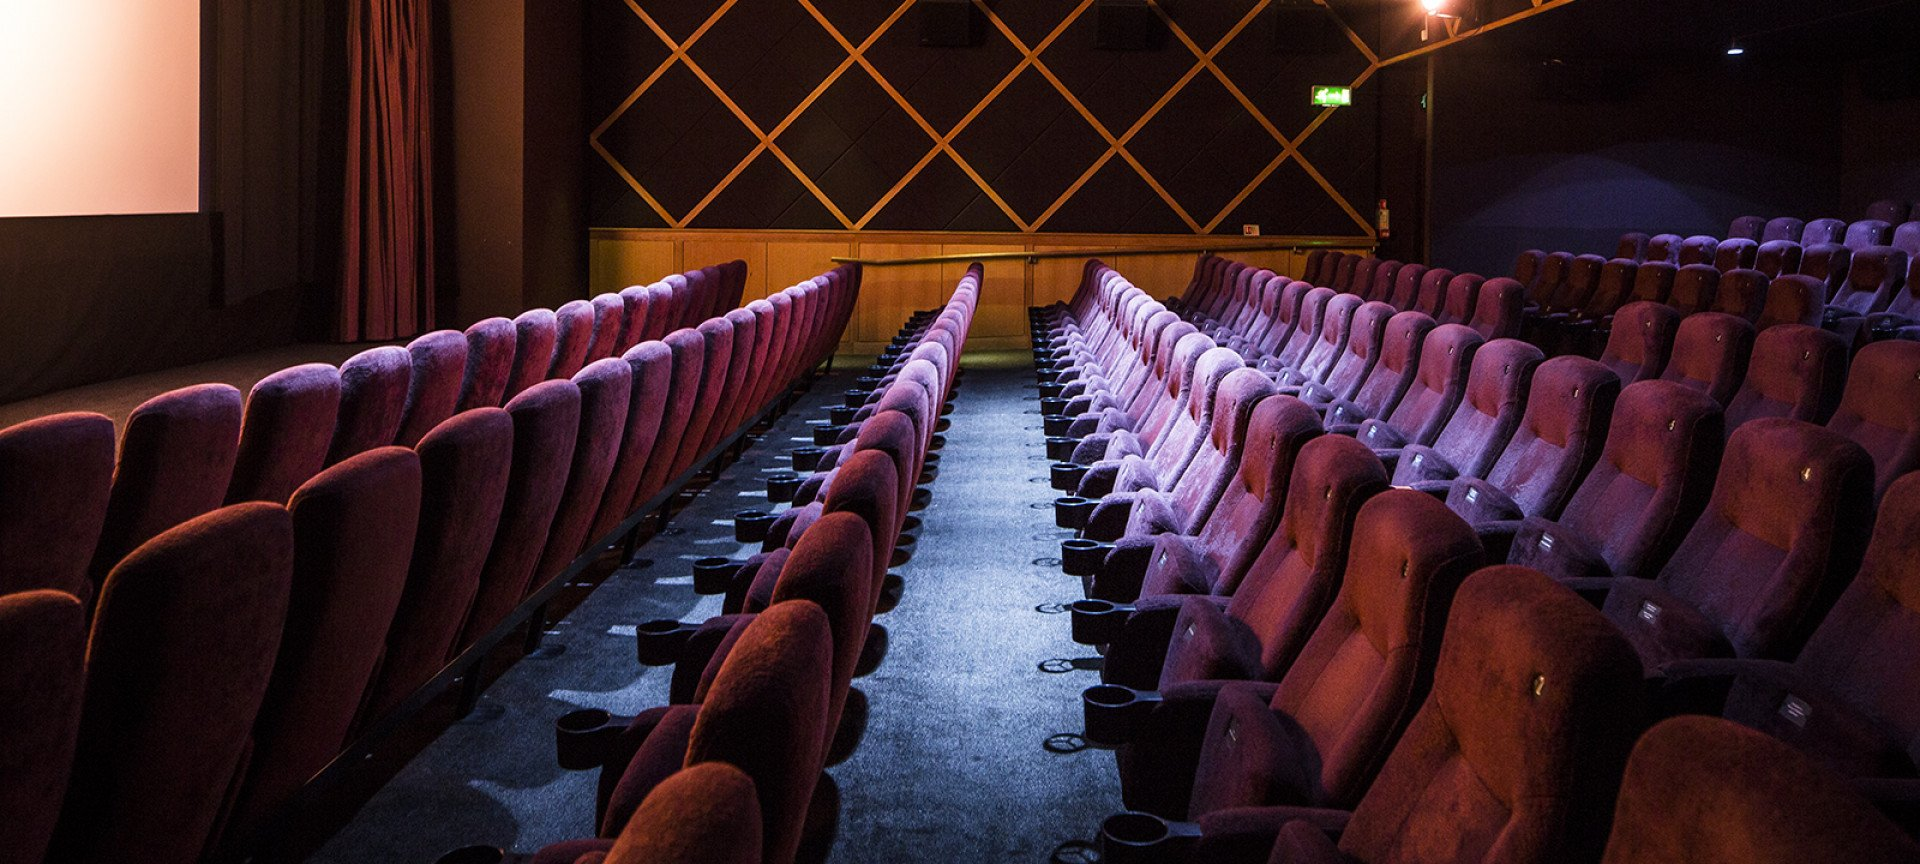 Venue and event hire<br>at Cinema City, Norwich